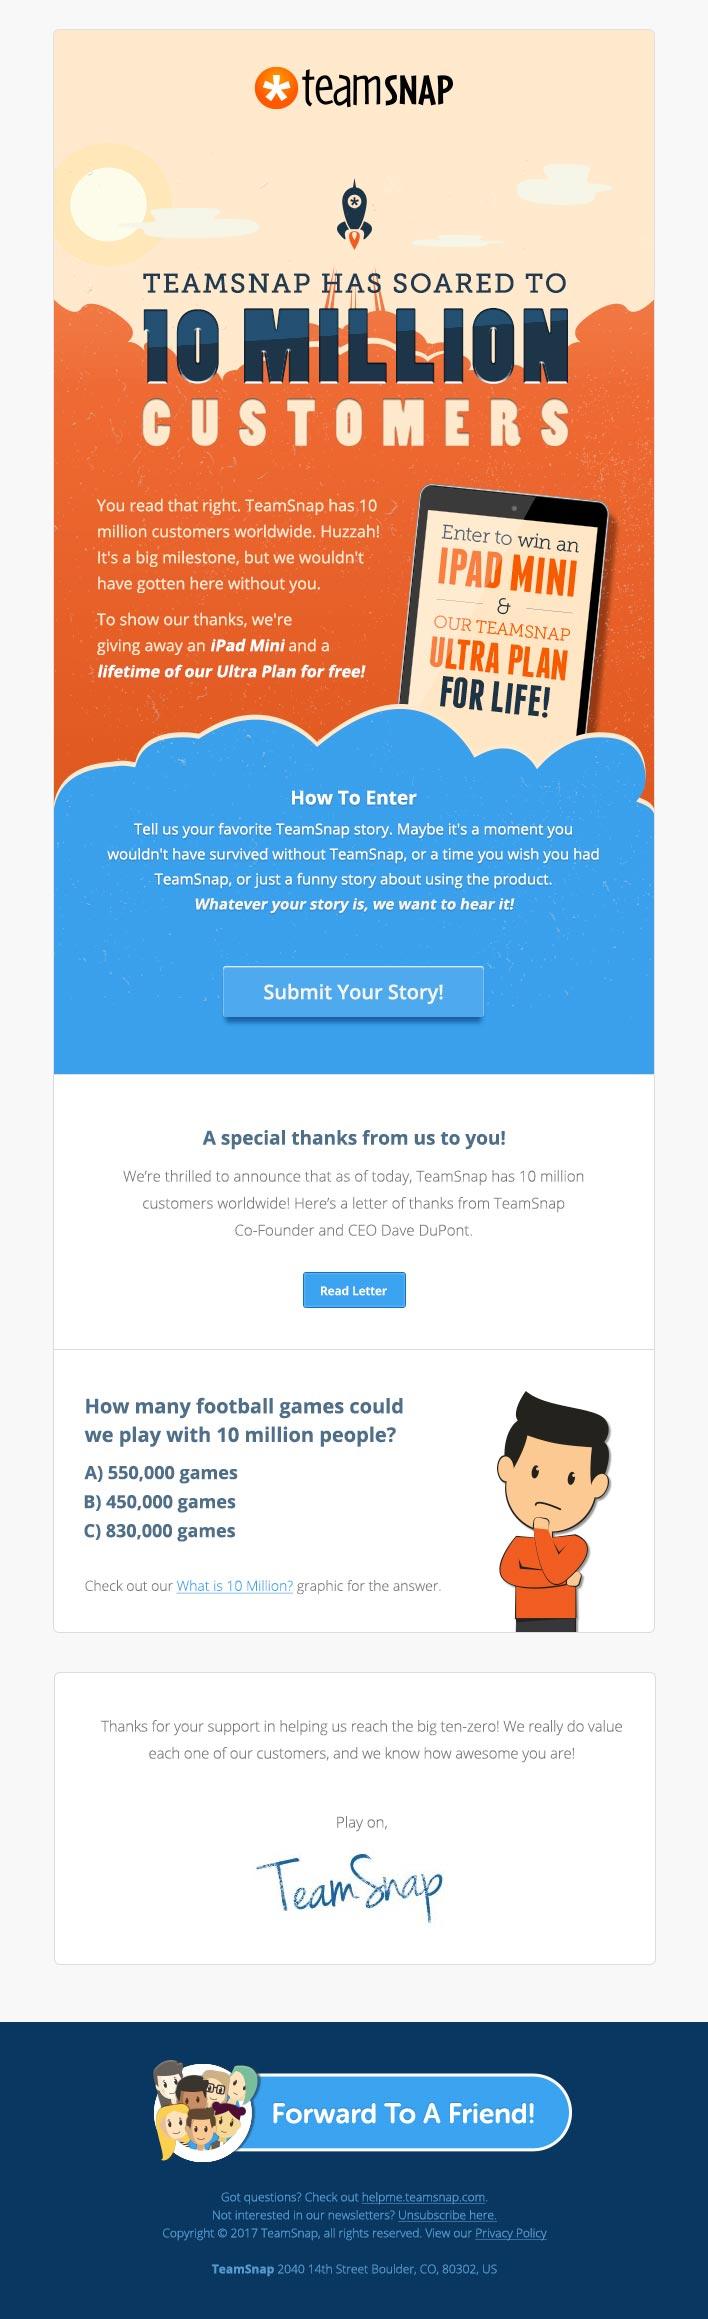 TeamSnap Partner Email